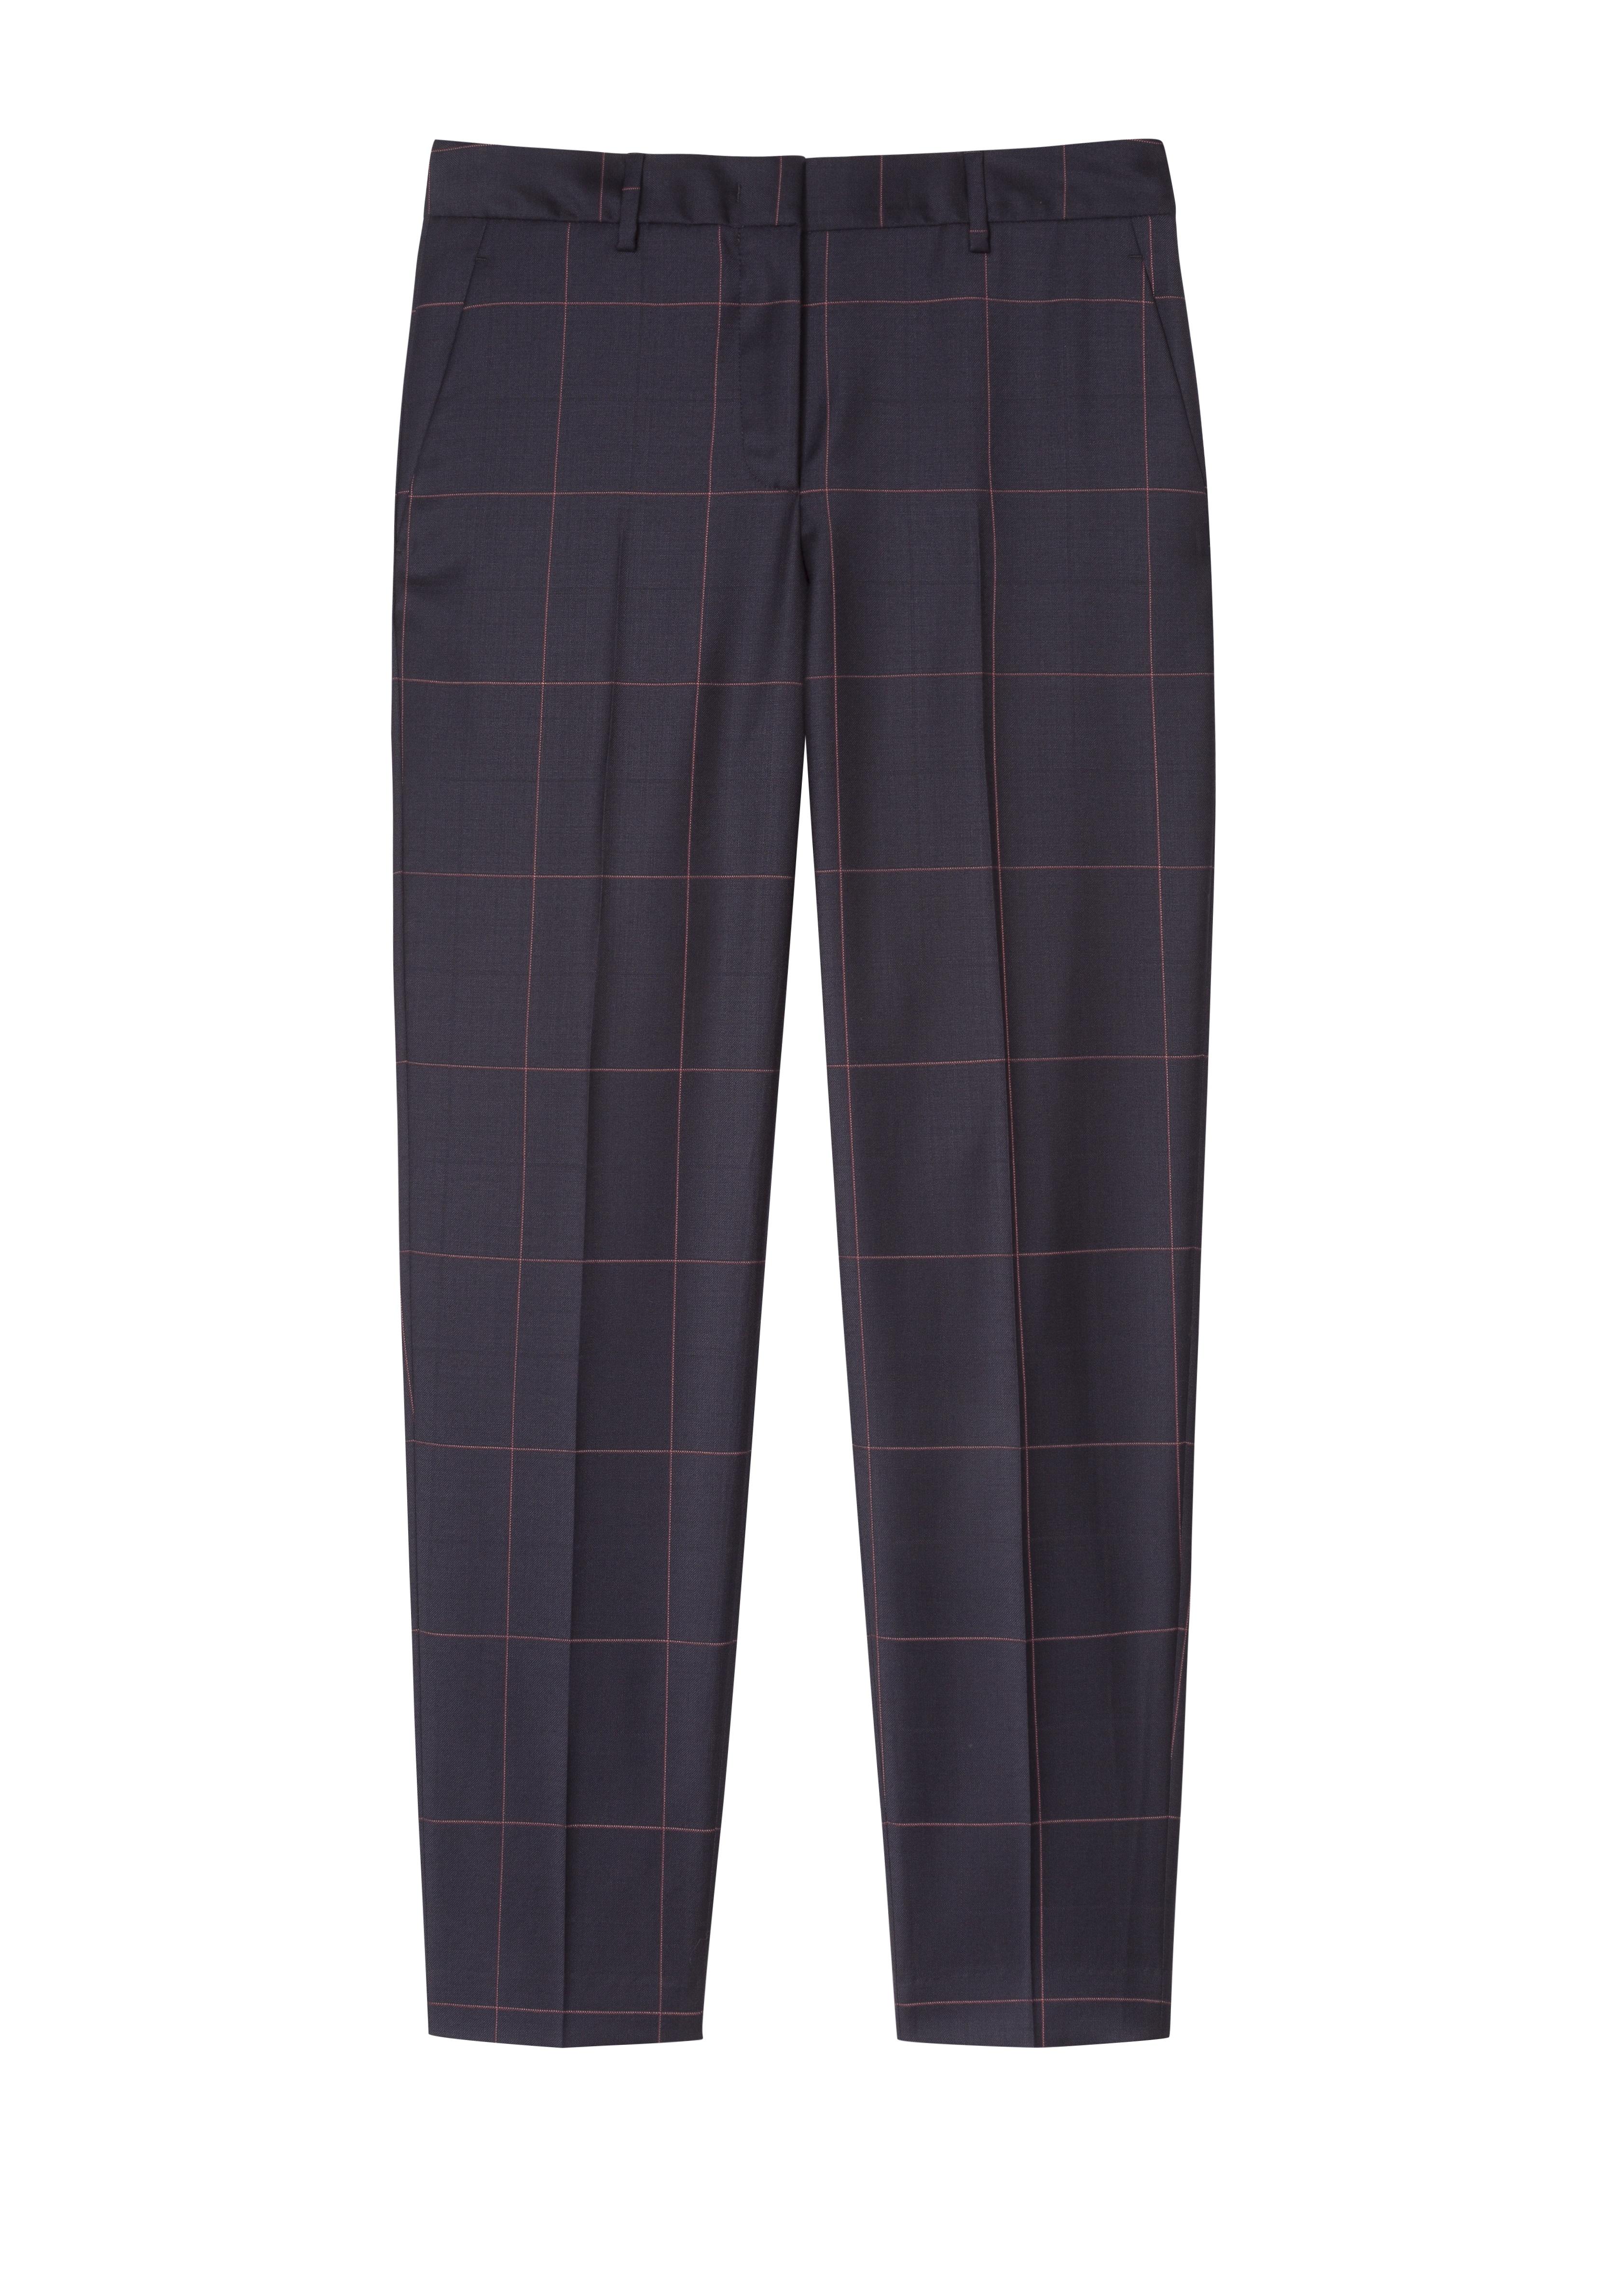 Paul Smith navy wool trousers pink windowpane check.jpg